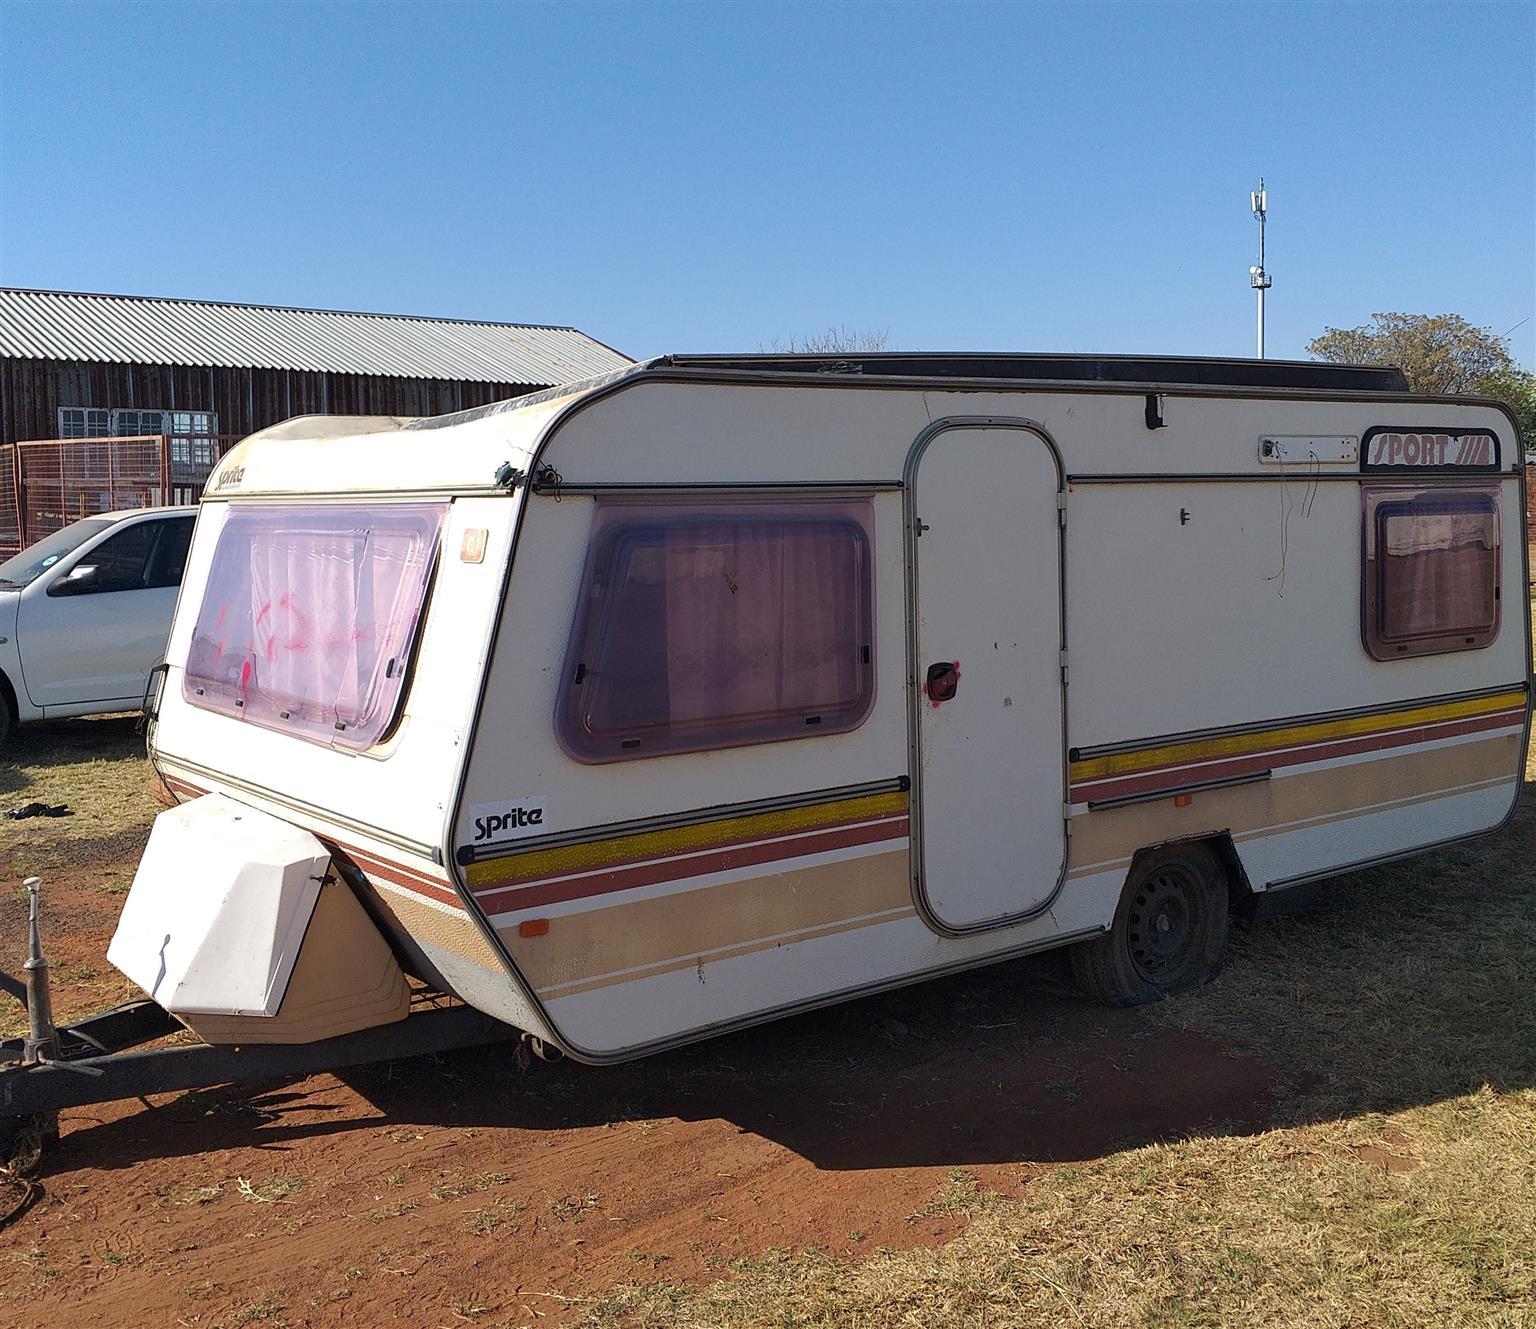 Sprite (Site) Caravan